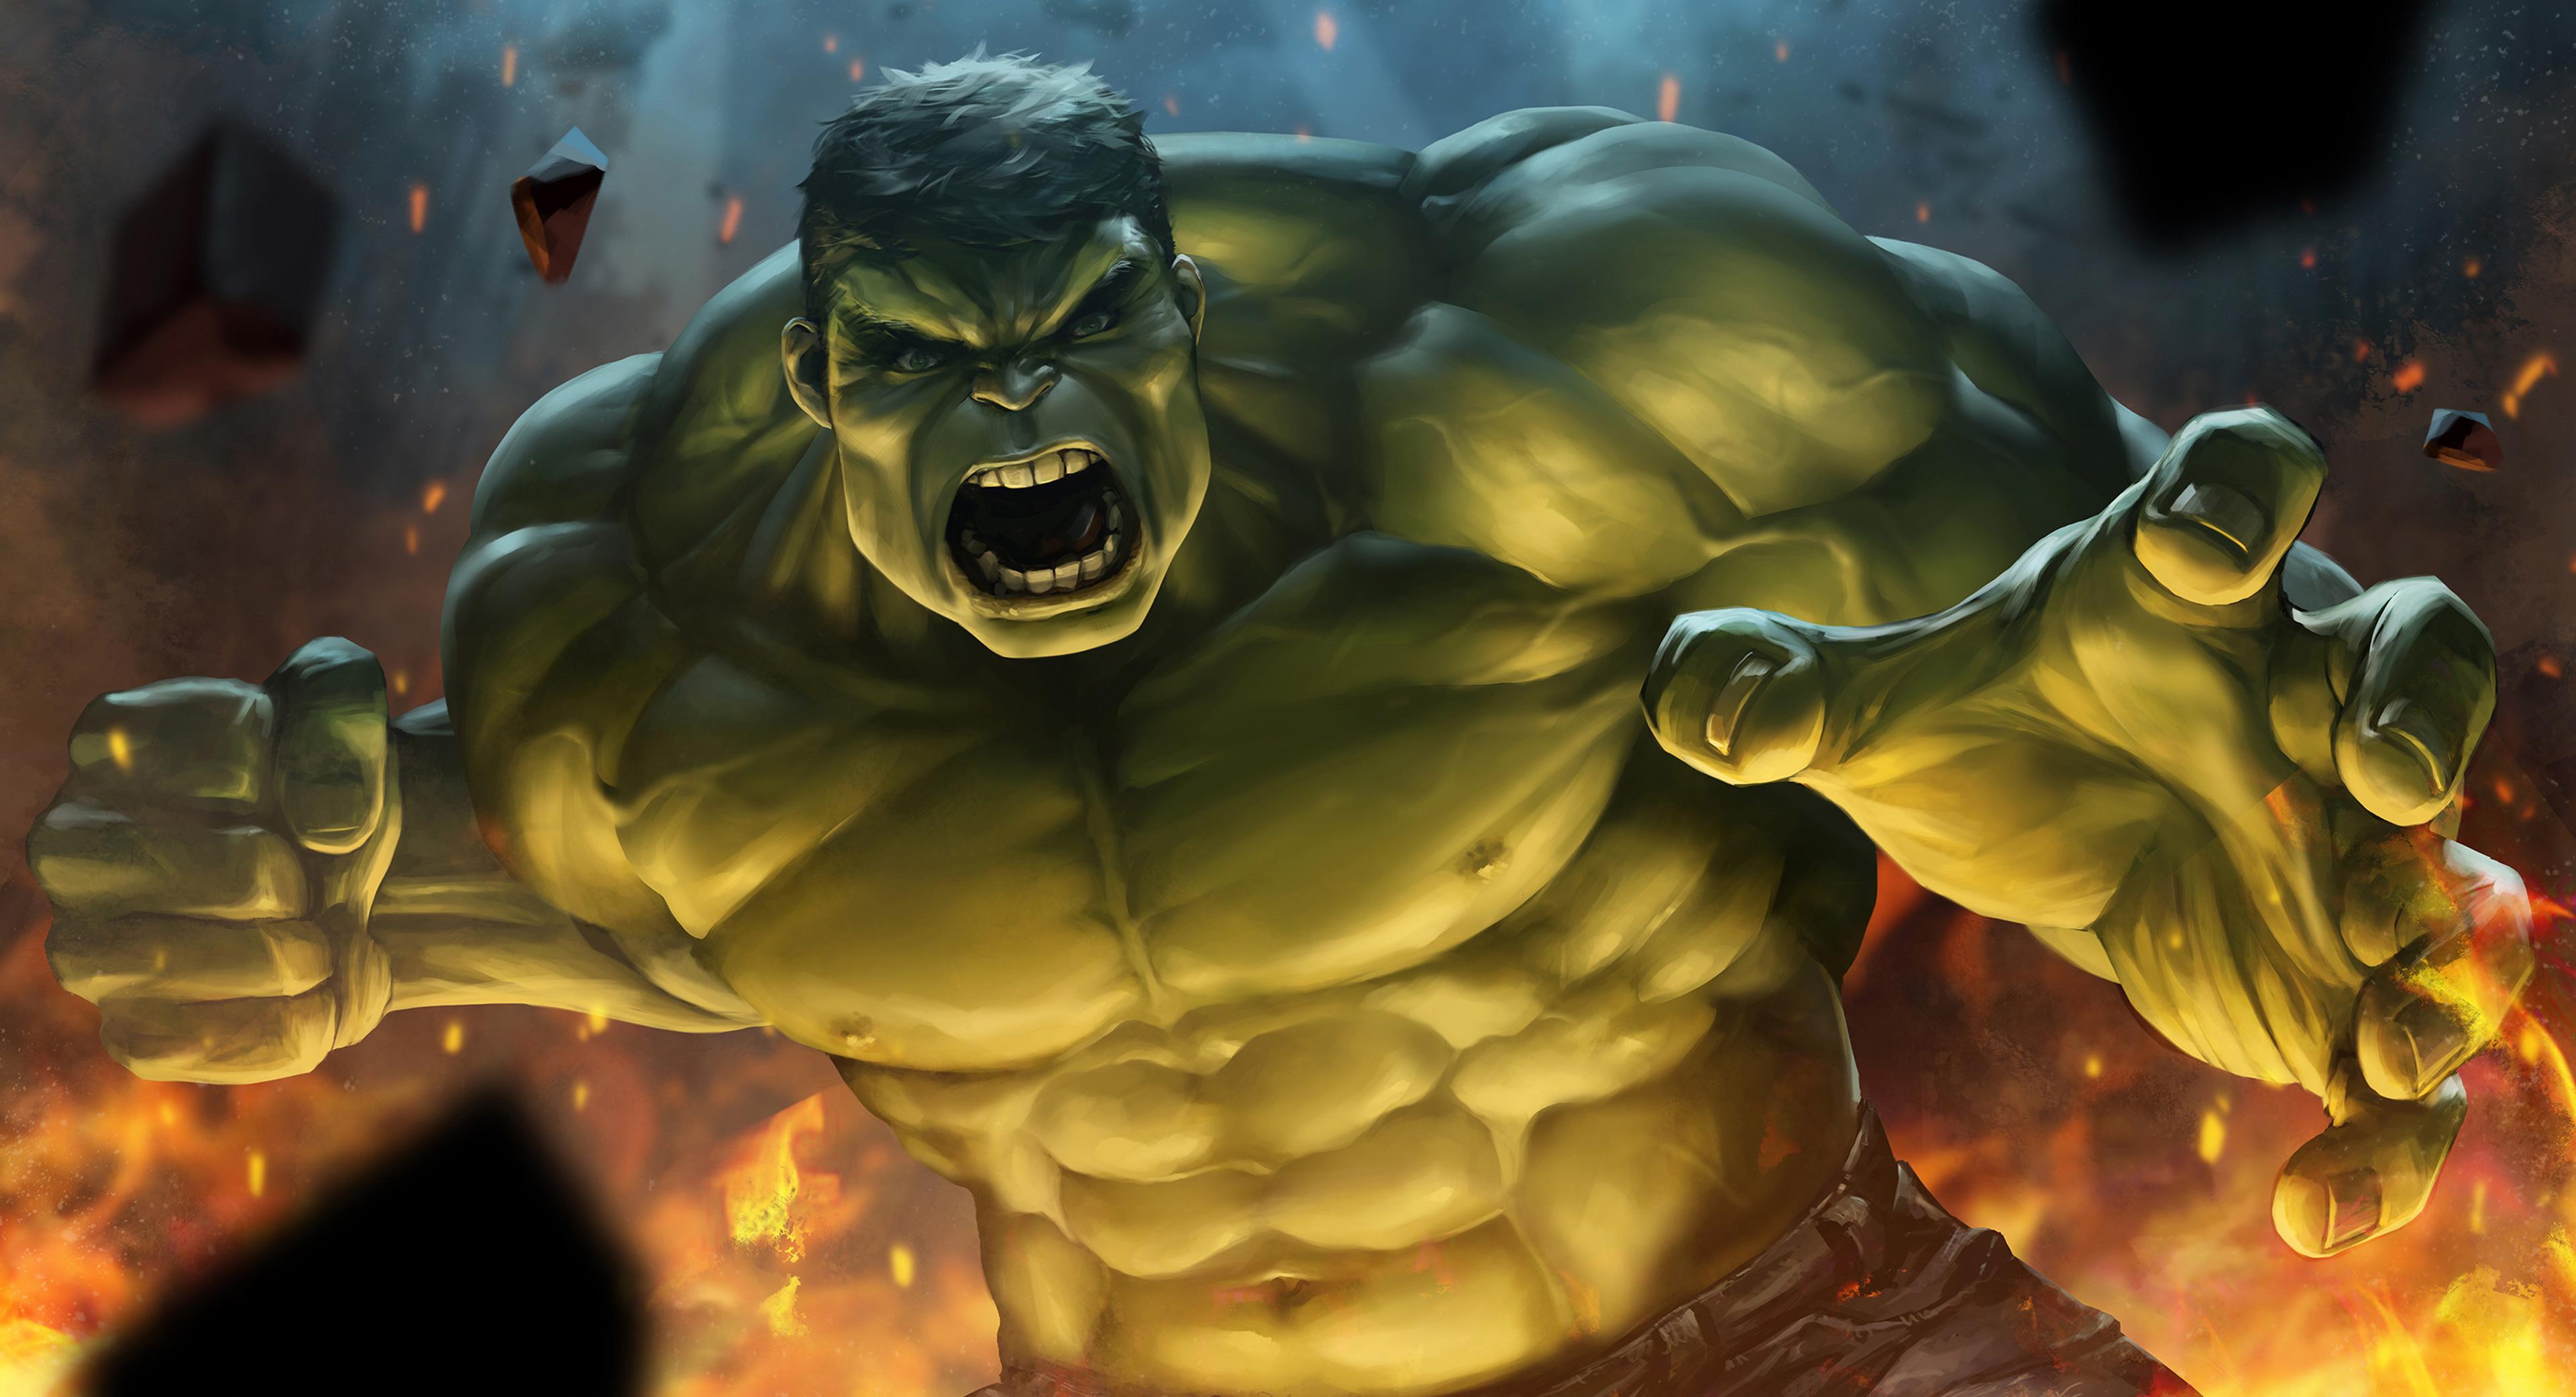 Hulk Smash Wallpaper - Wallpaperall